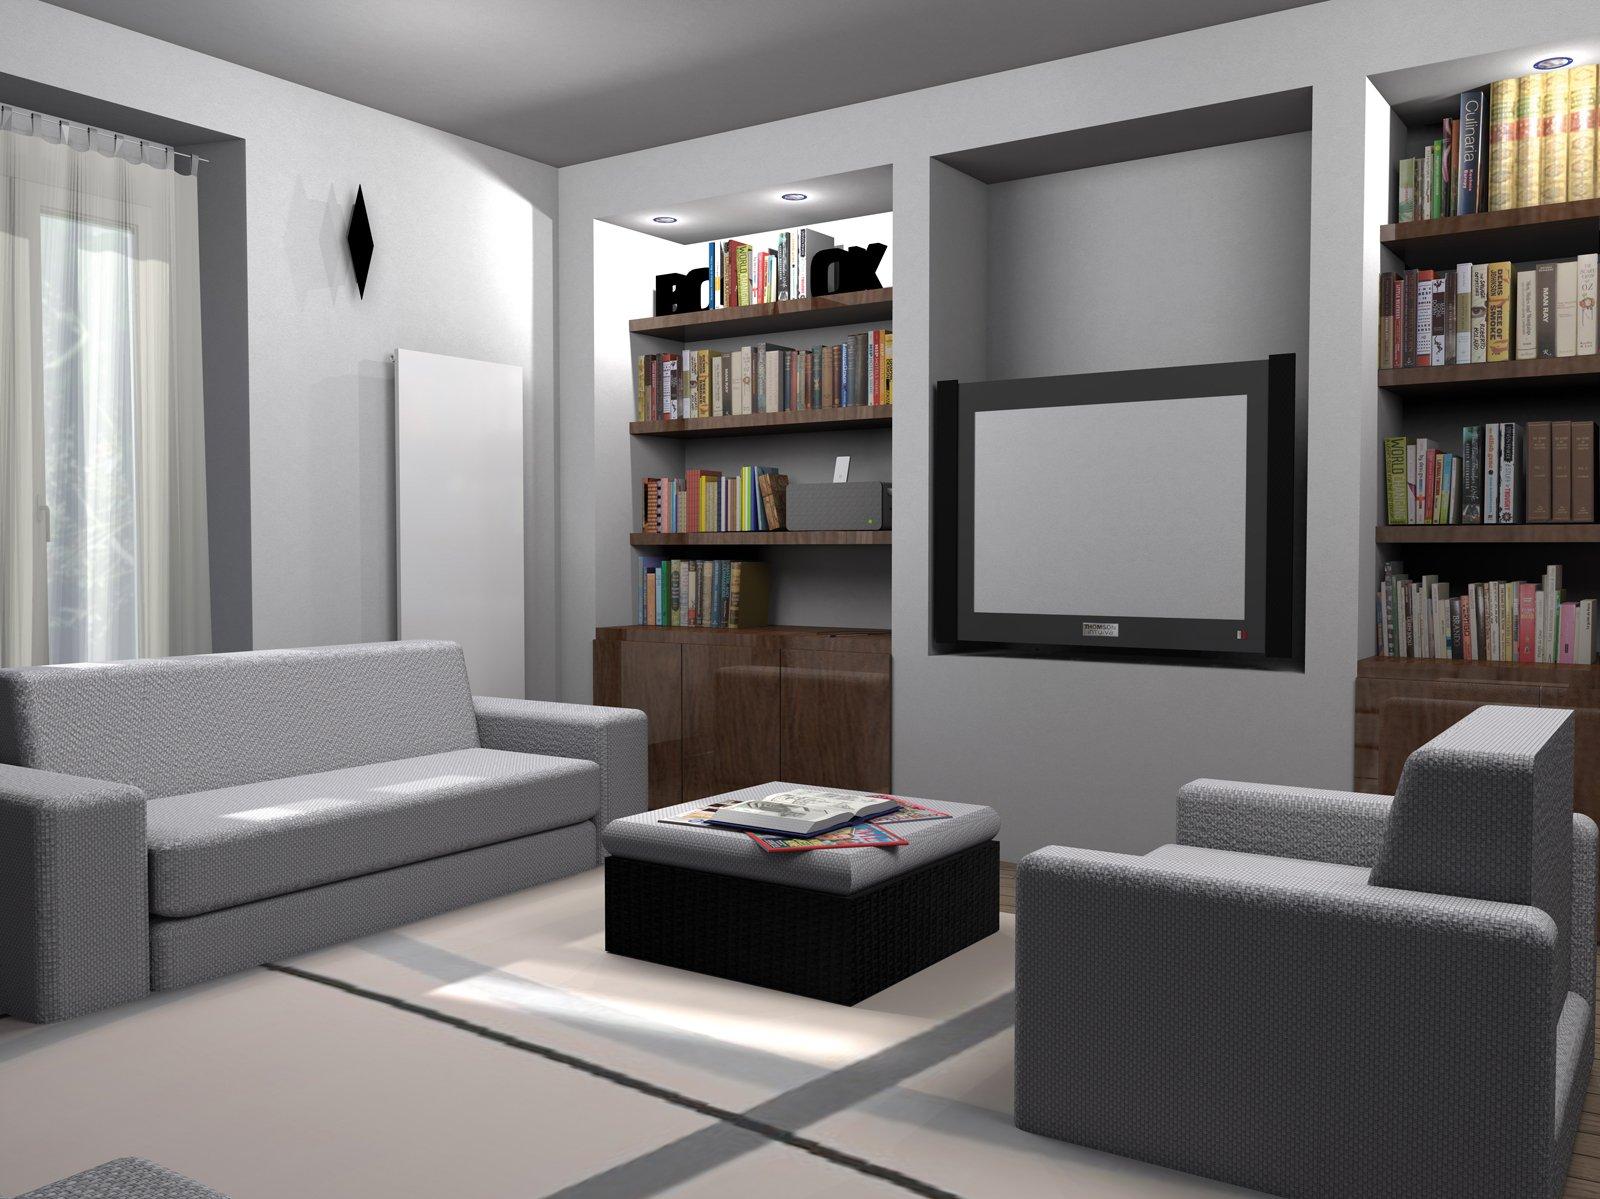 Parete In Cartongesso Bassa : La parete libreria in cartongesso cose di casa